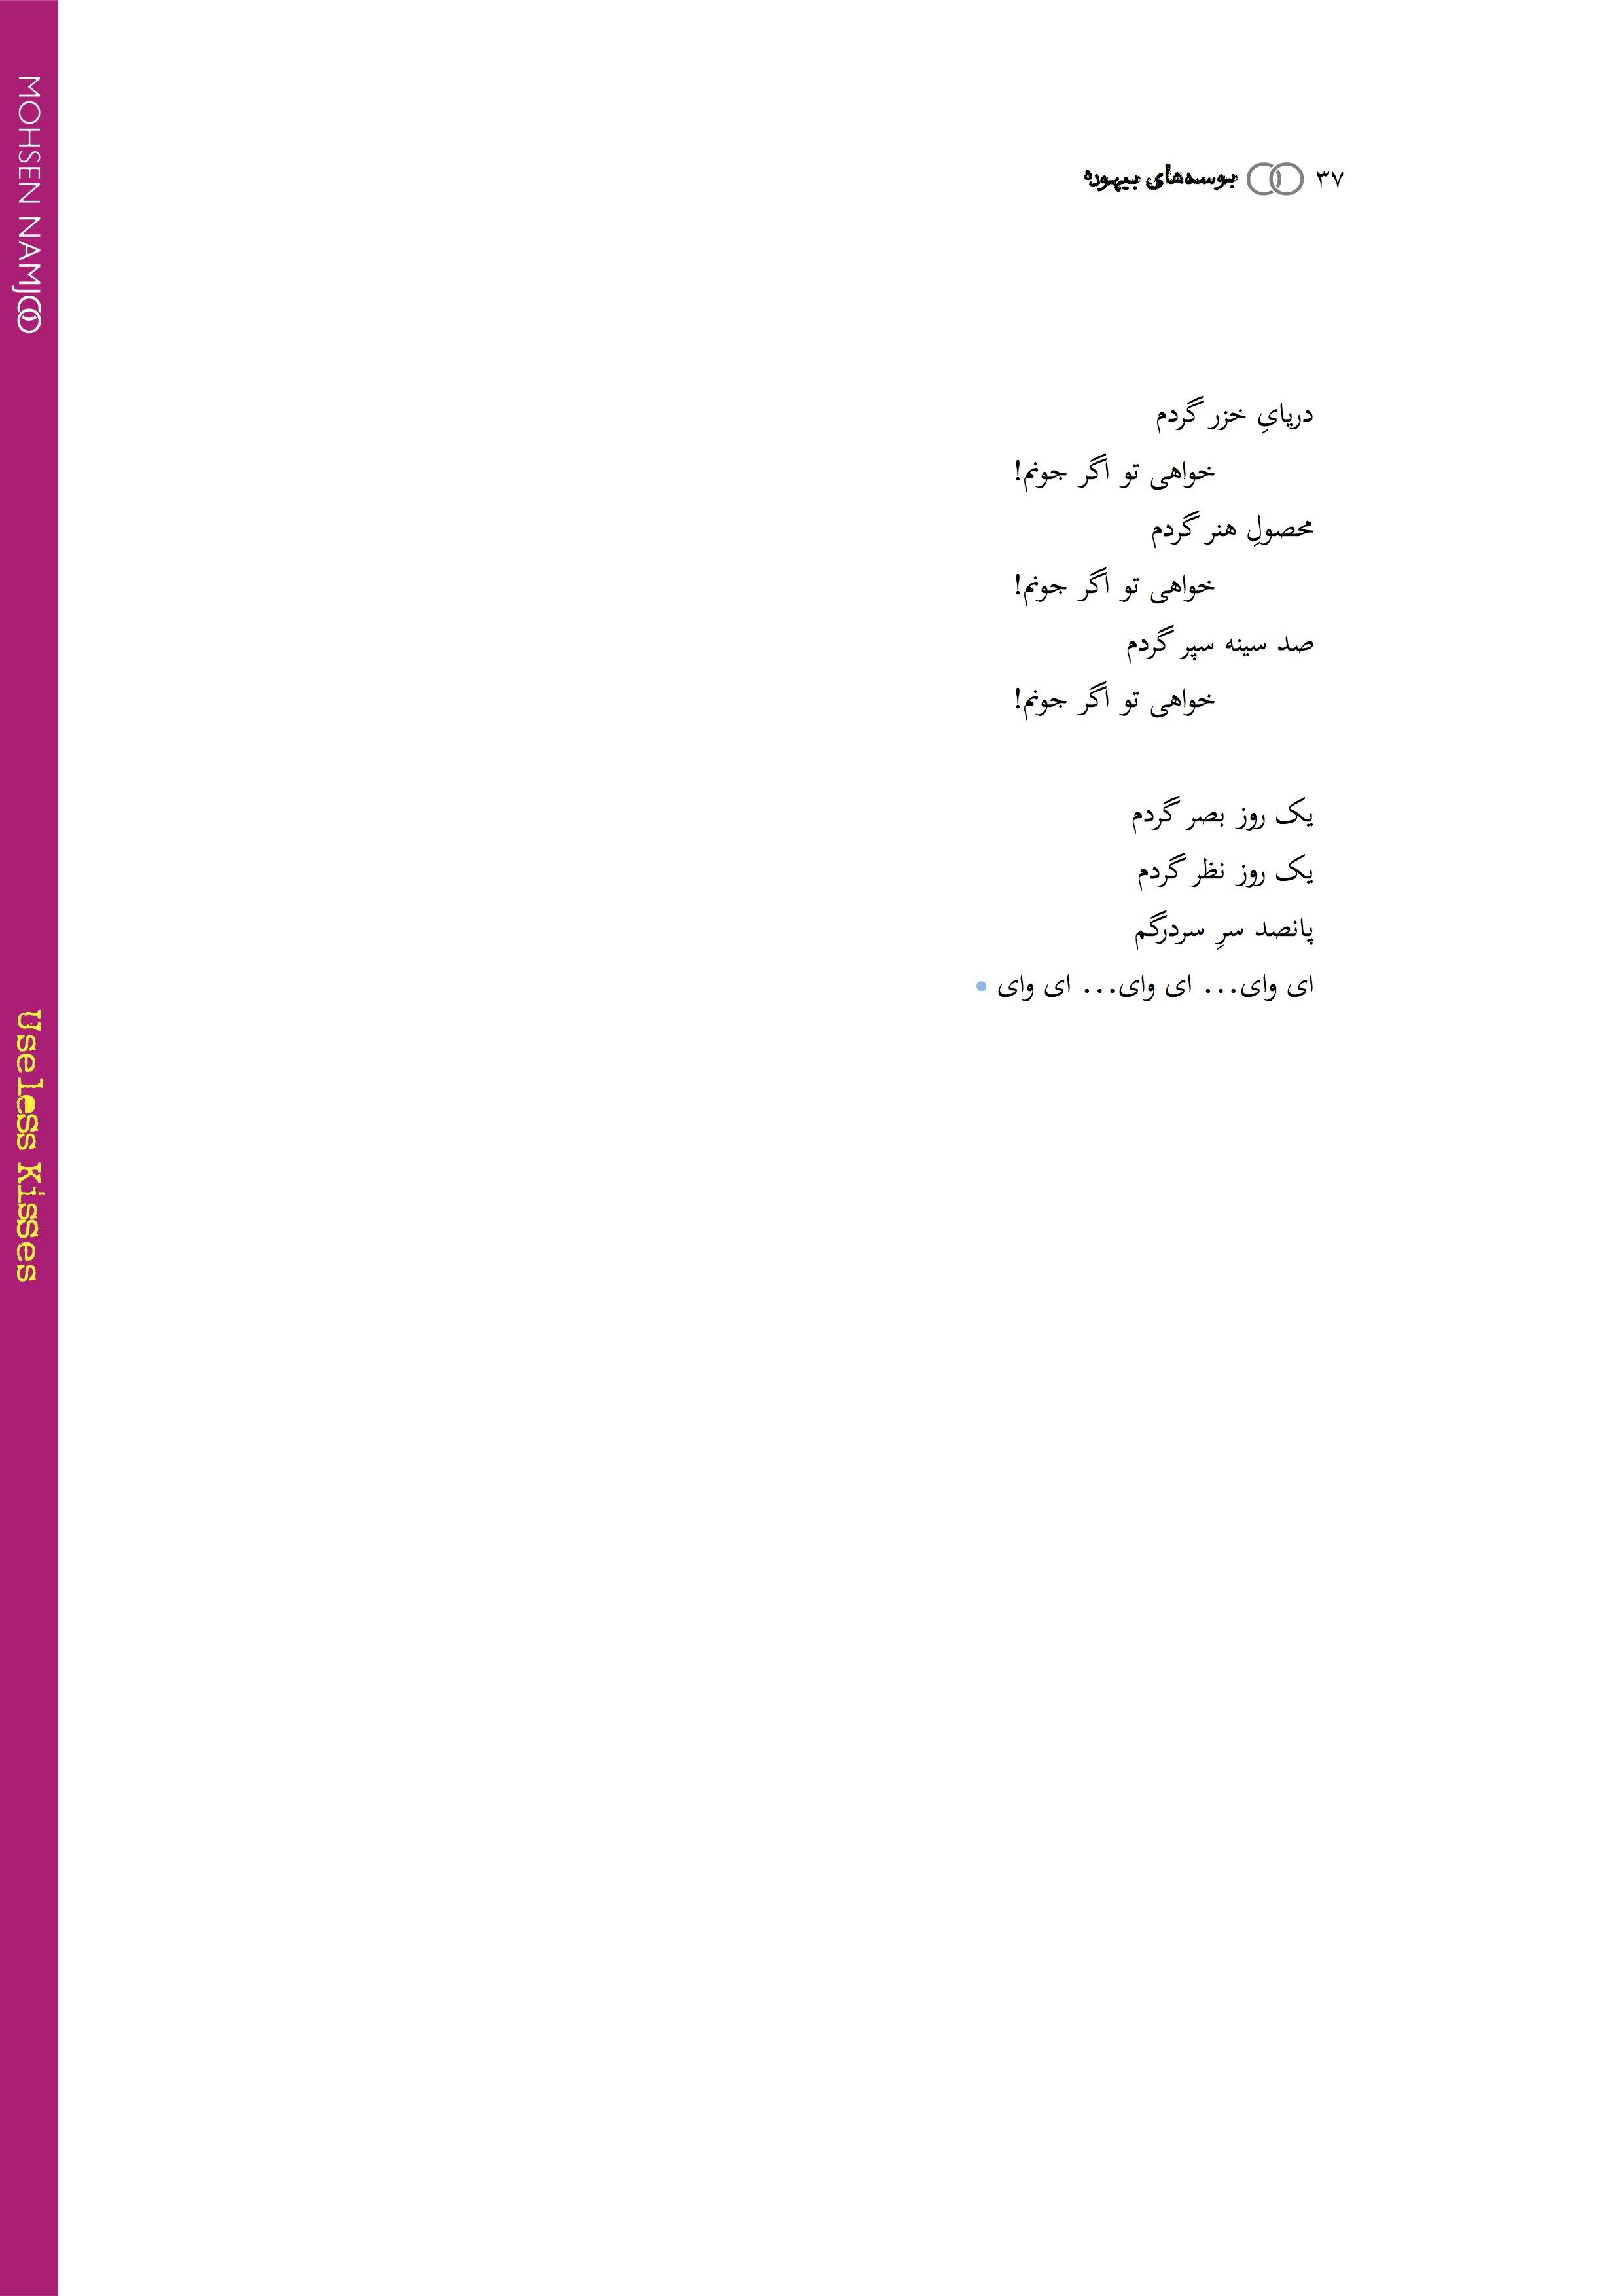 36Useless Kisses eBook (2nd Edition).jpg